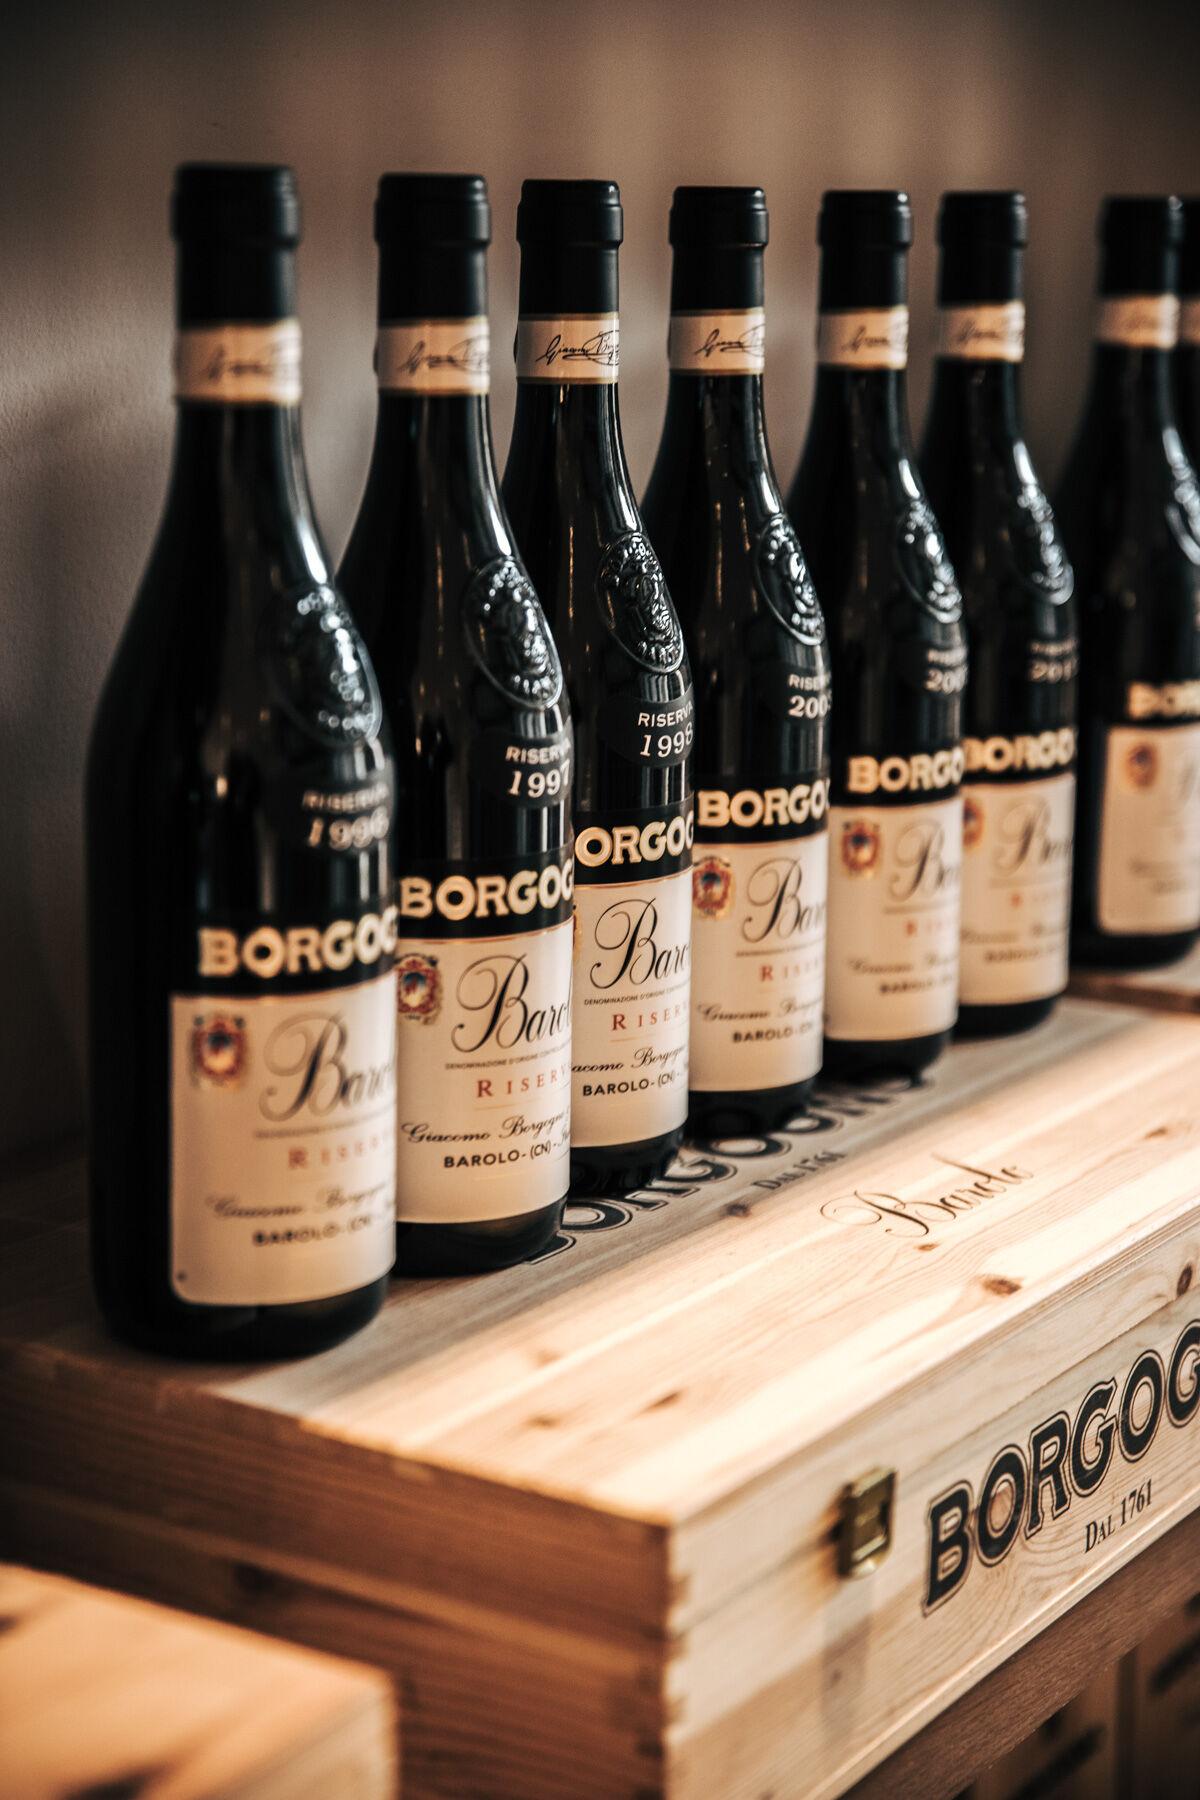 borgogno-piemonte-138